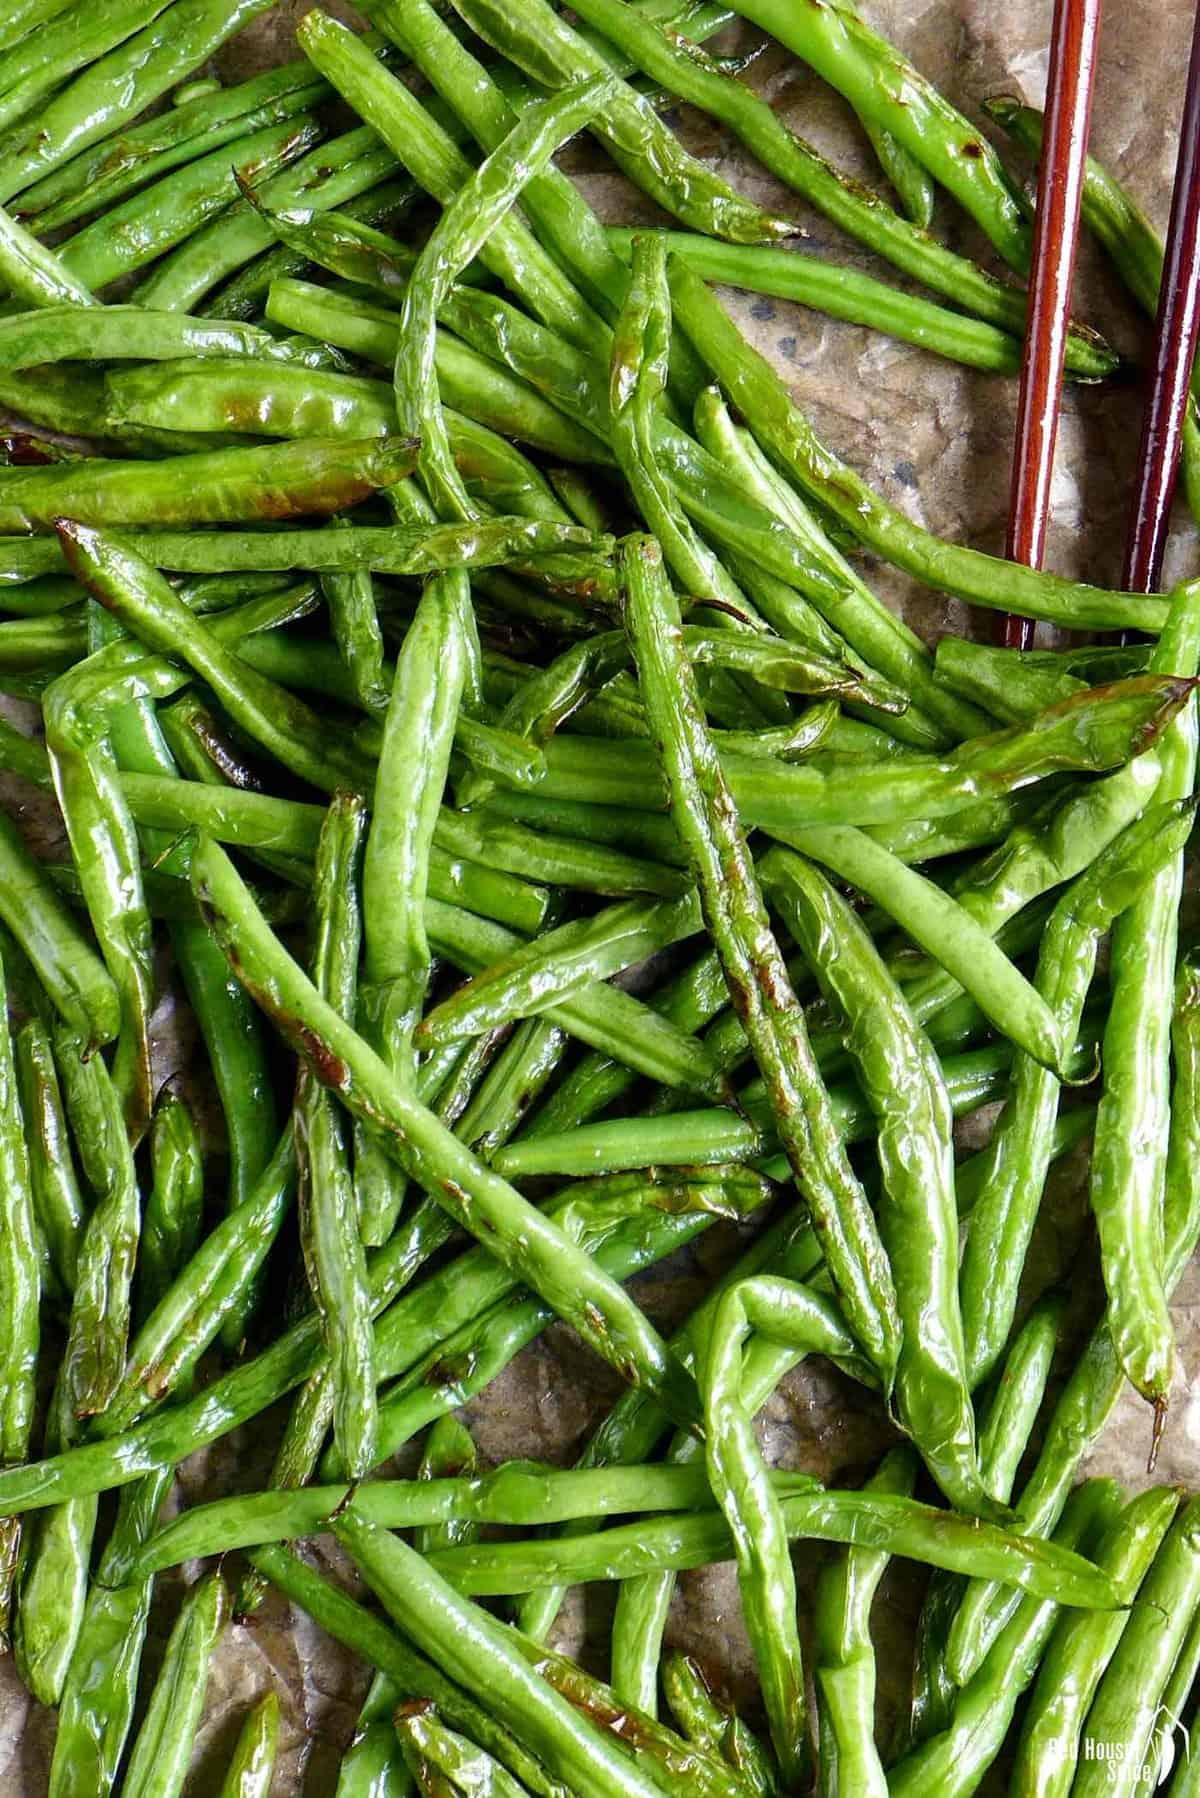 Charred, blistered green beans